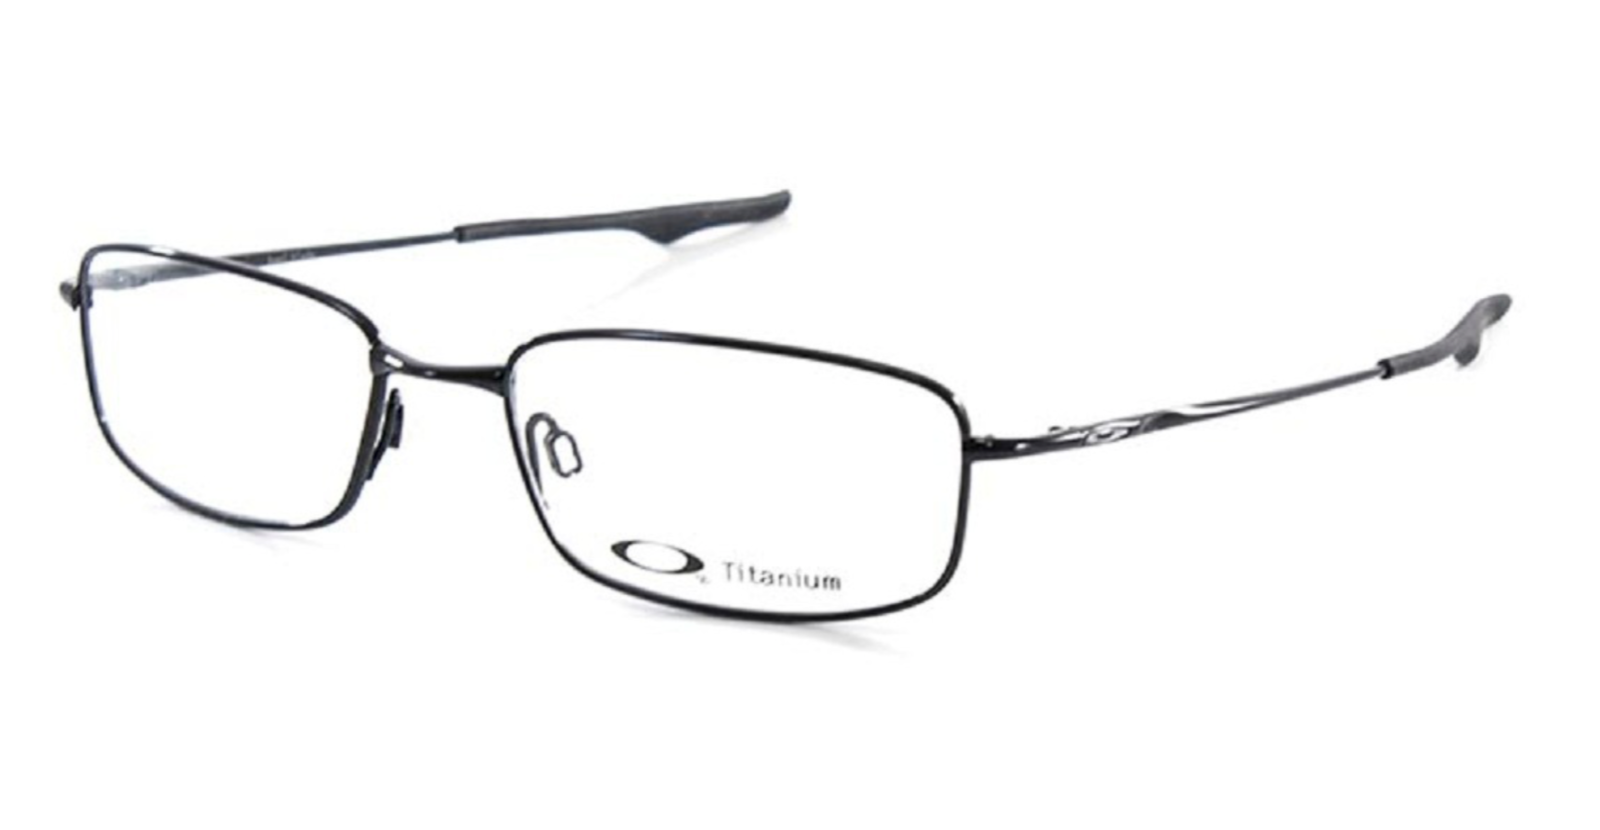 166fb02538 Brand New OAKLEY Titanium Eyeglasses KEEL BLADE OX3125-0153 53-18 Black  Frames -  199.95